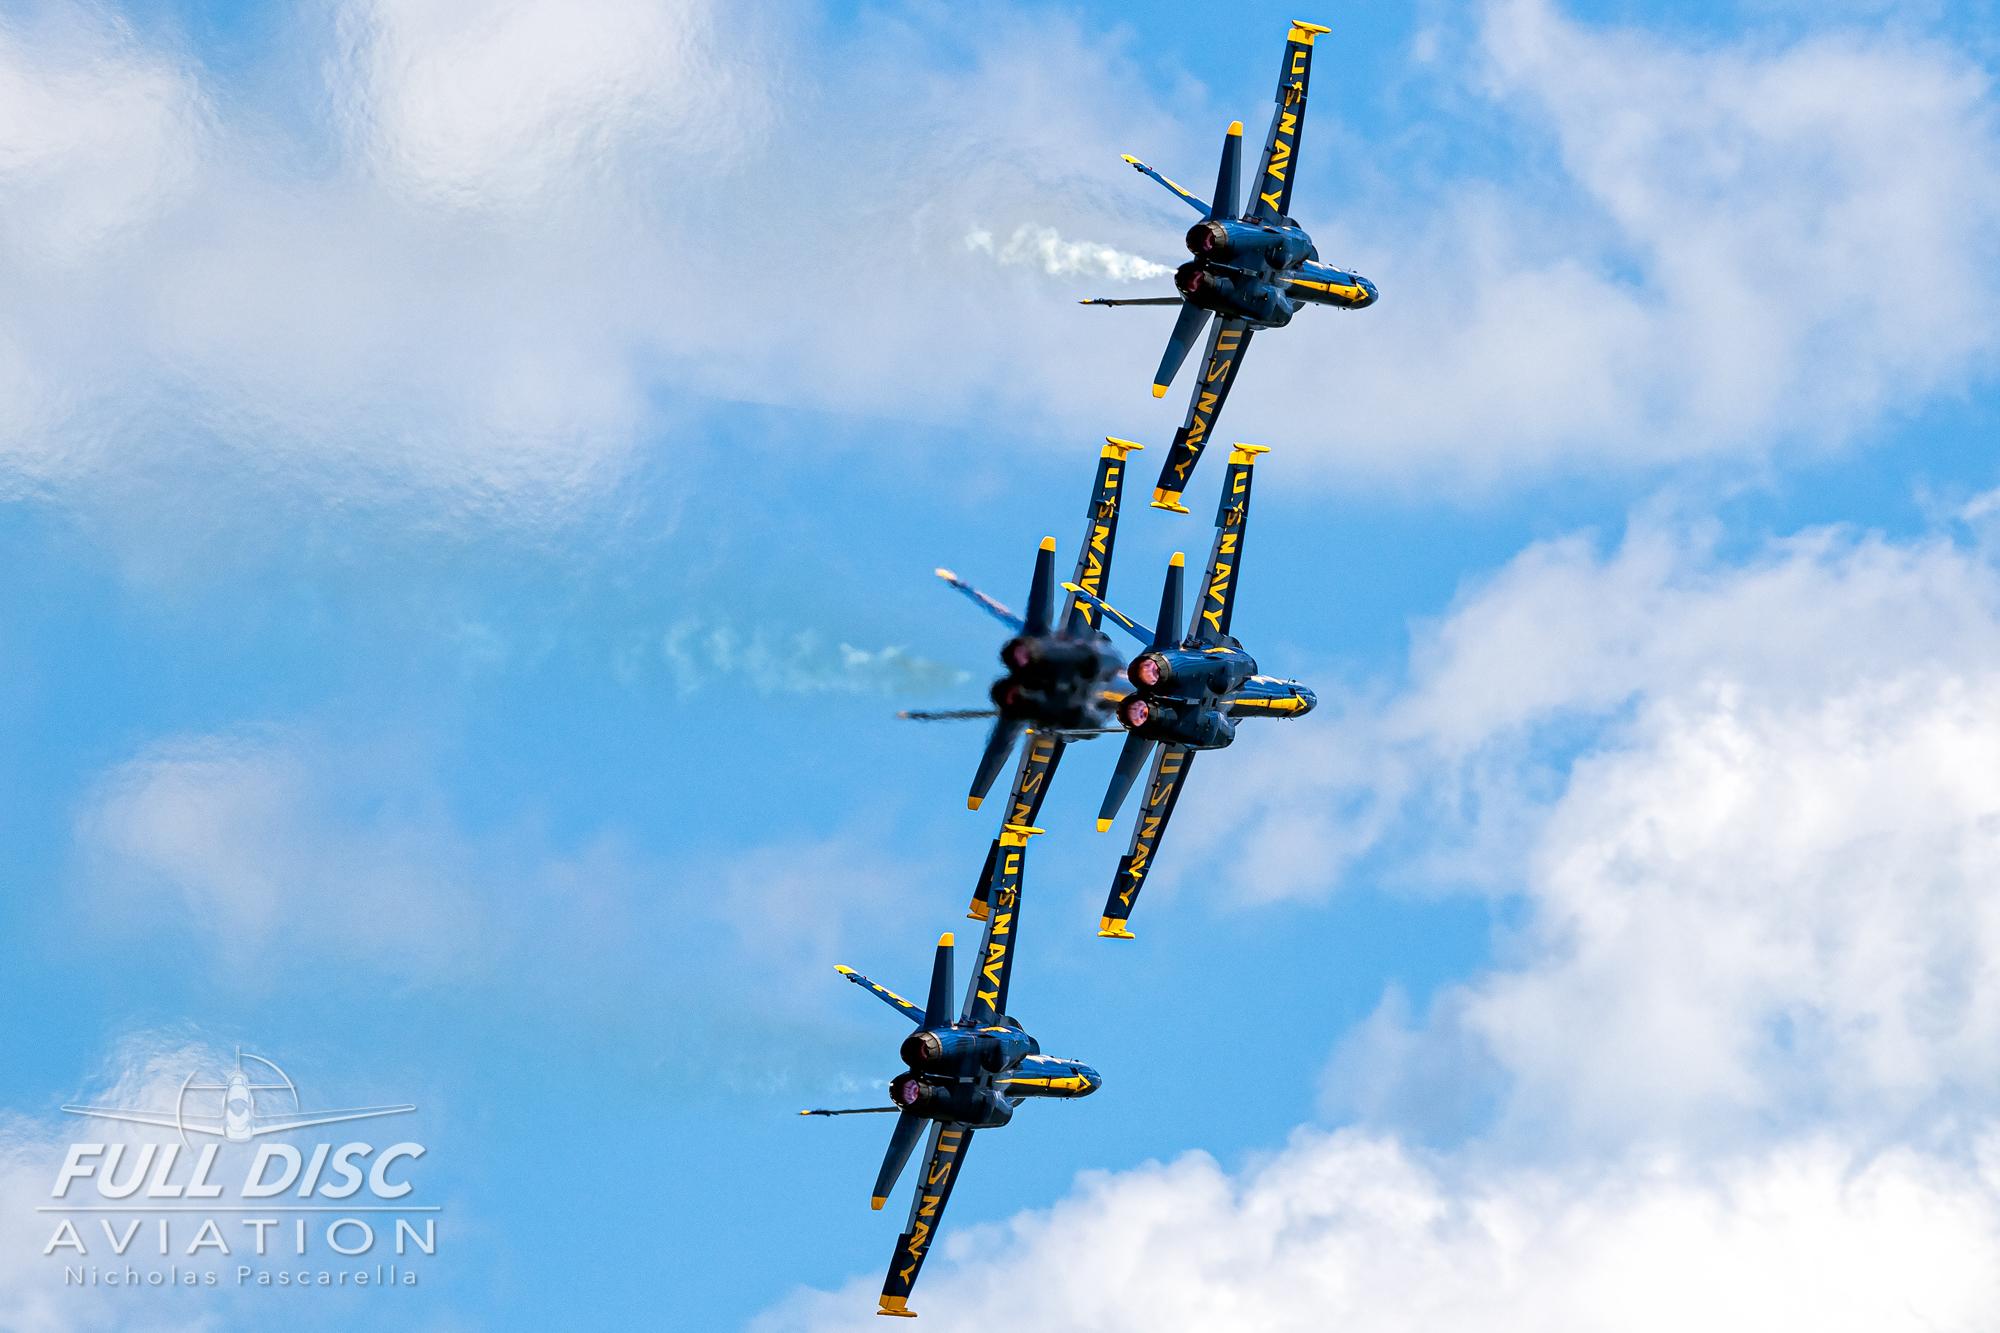 nickpascarella_fulldiscaviation_oceancityairshow_aviation_burner270_blueangels.jpg